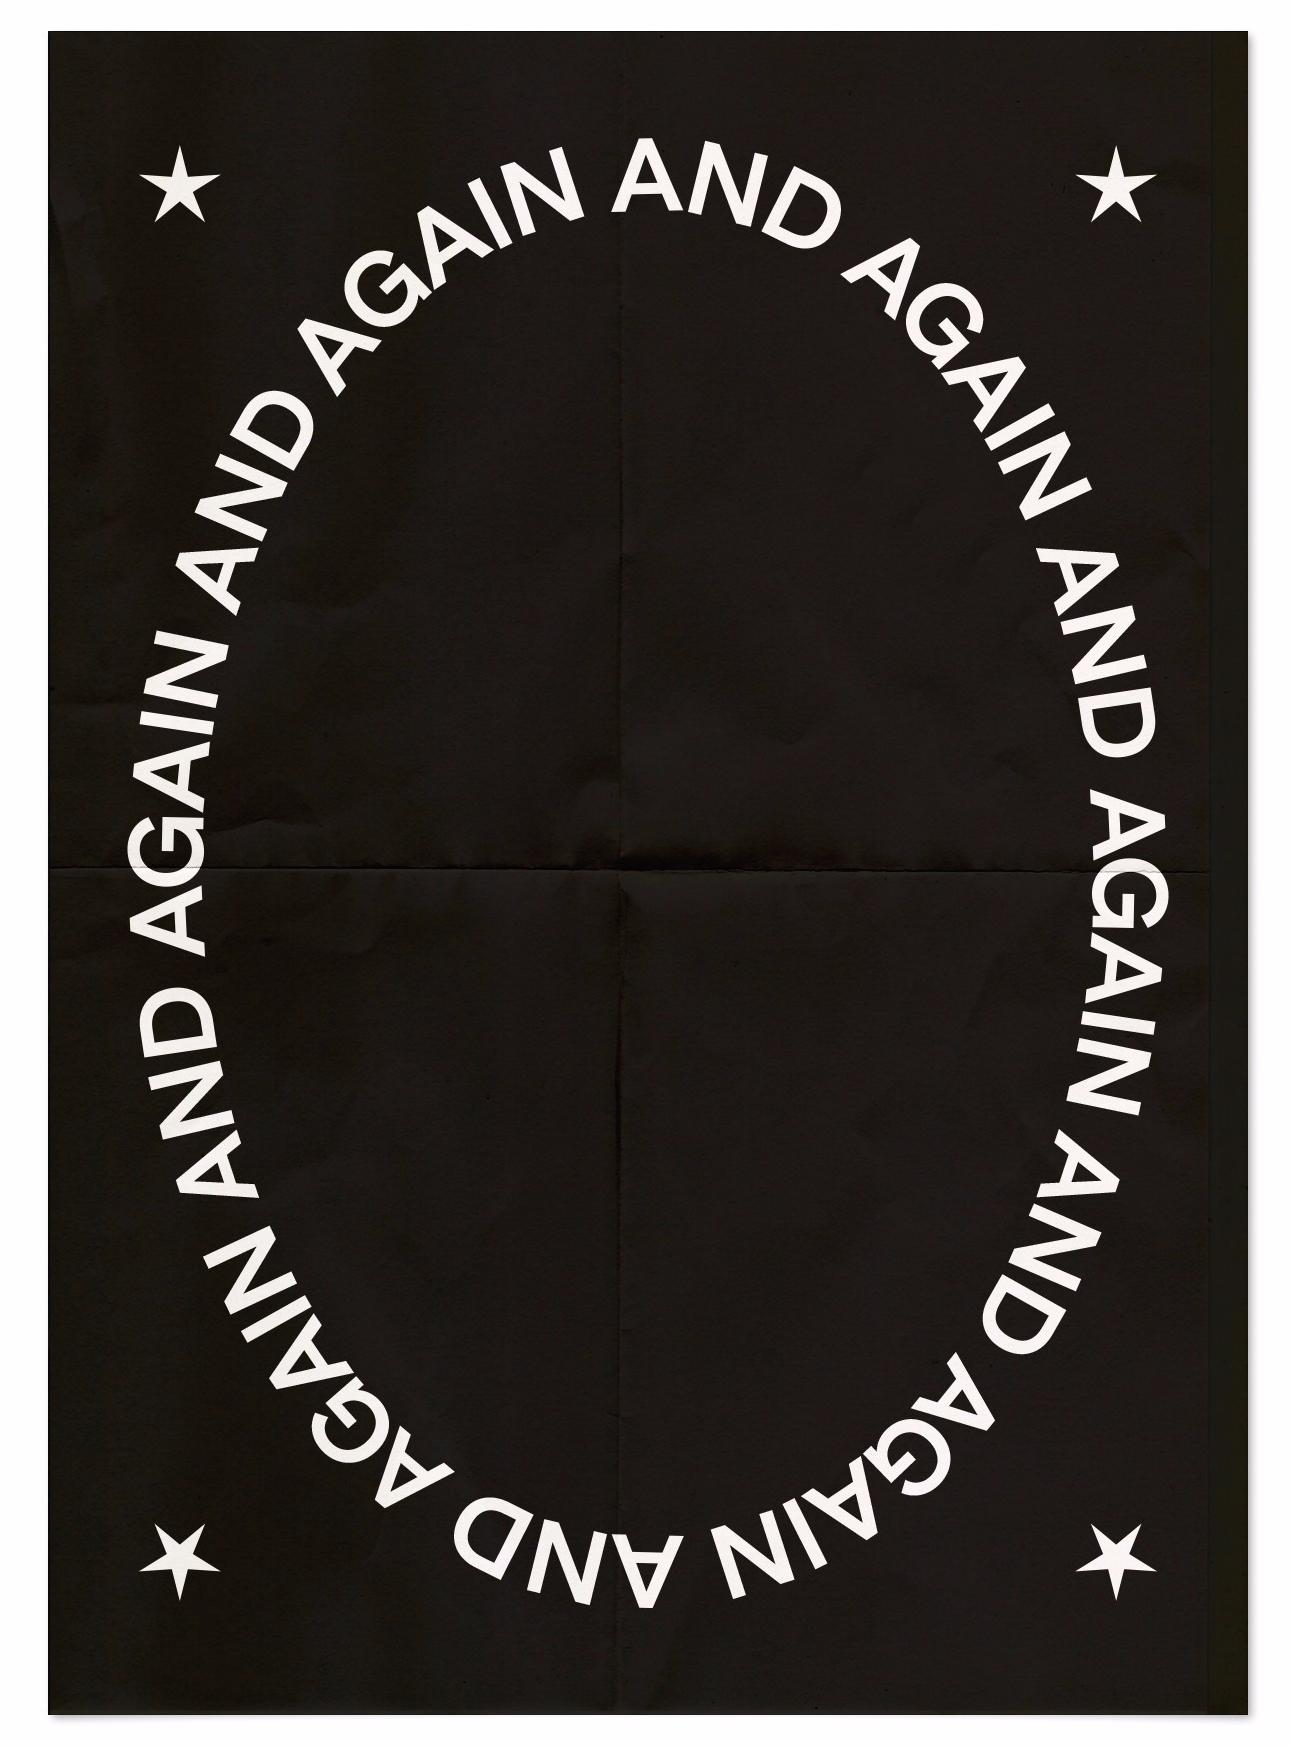 Poster Visual Approach series 6 - brunorodrigues | ello